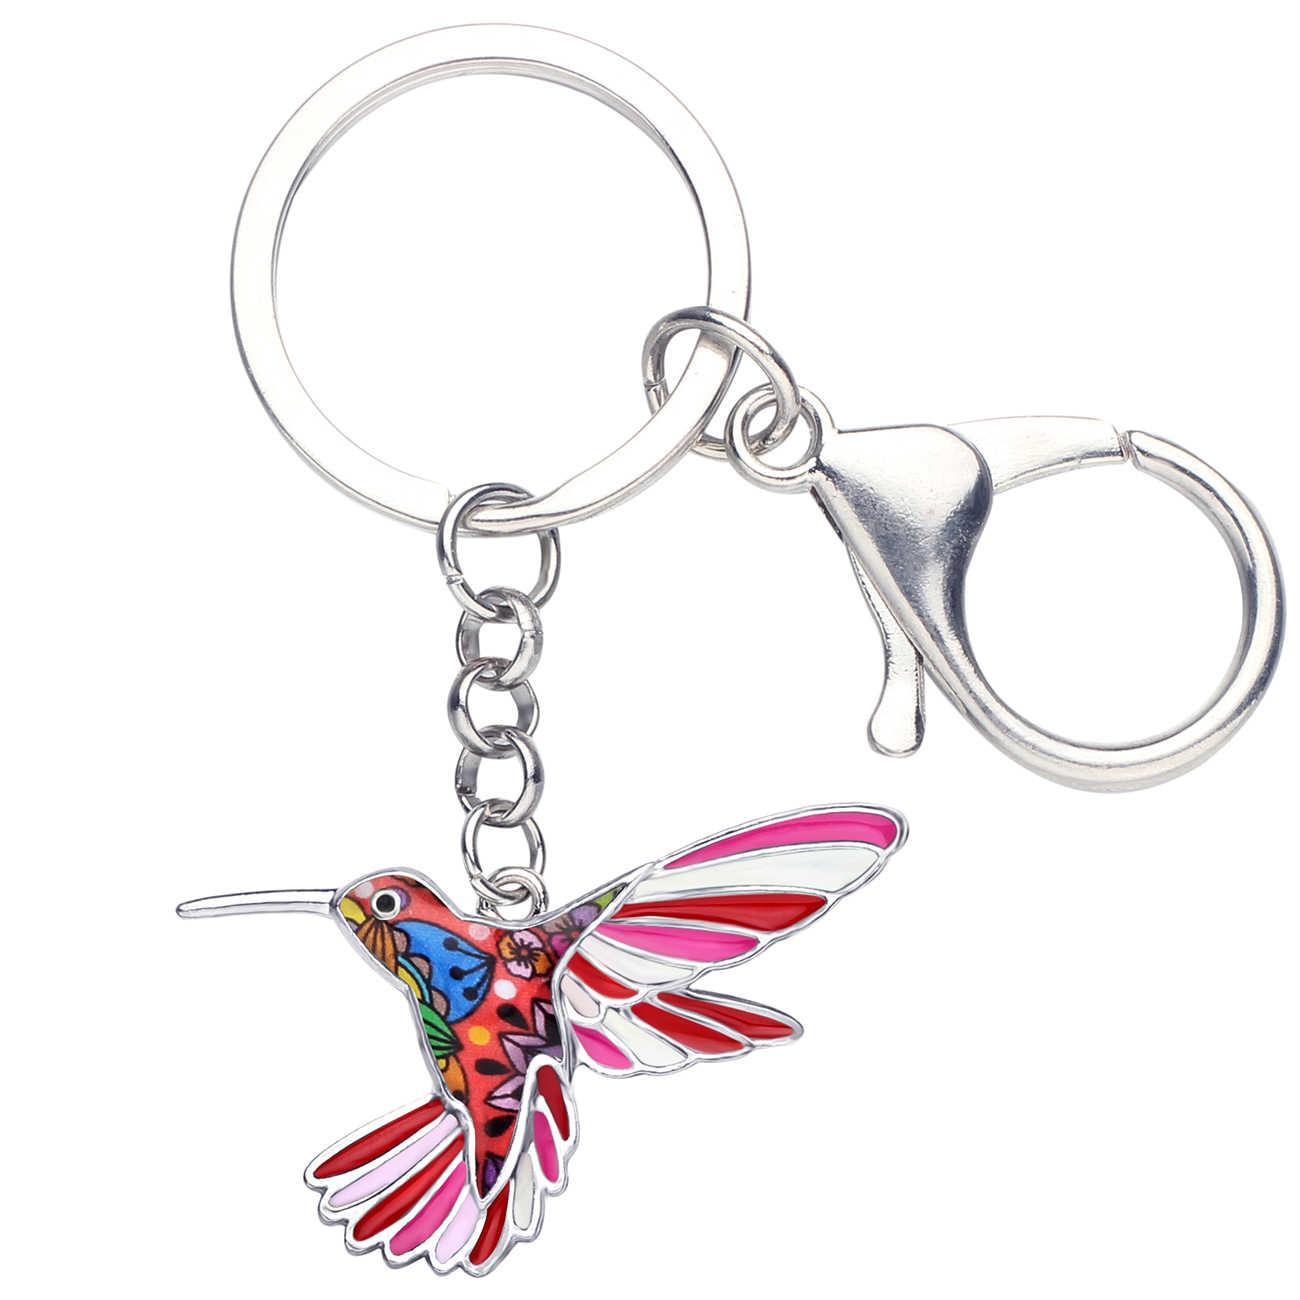 Bonsny Enamel Lichtmetalen Bloemen Kolibrie Vogel Sleutelhanger Sleutelhangers Ring Mode Dier Sieraden Voor Vrouwen Meisjes Zak Auto Charmes Geschenken